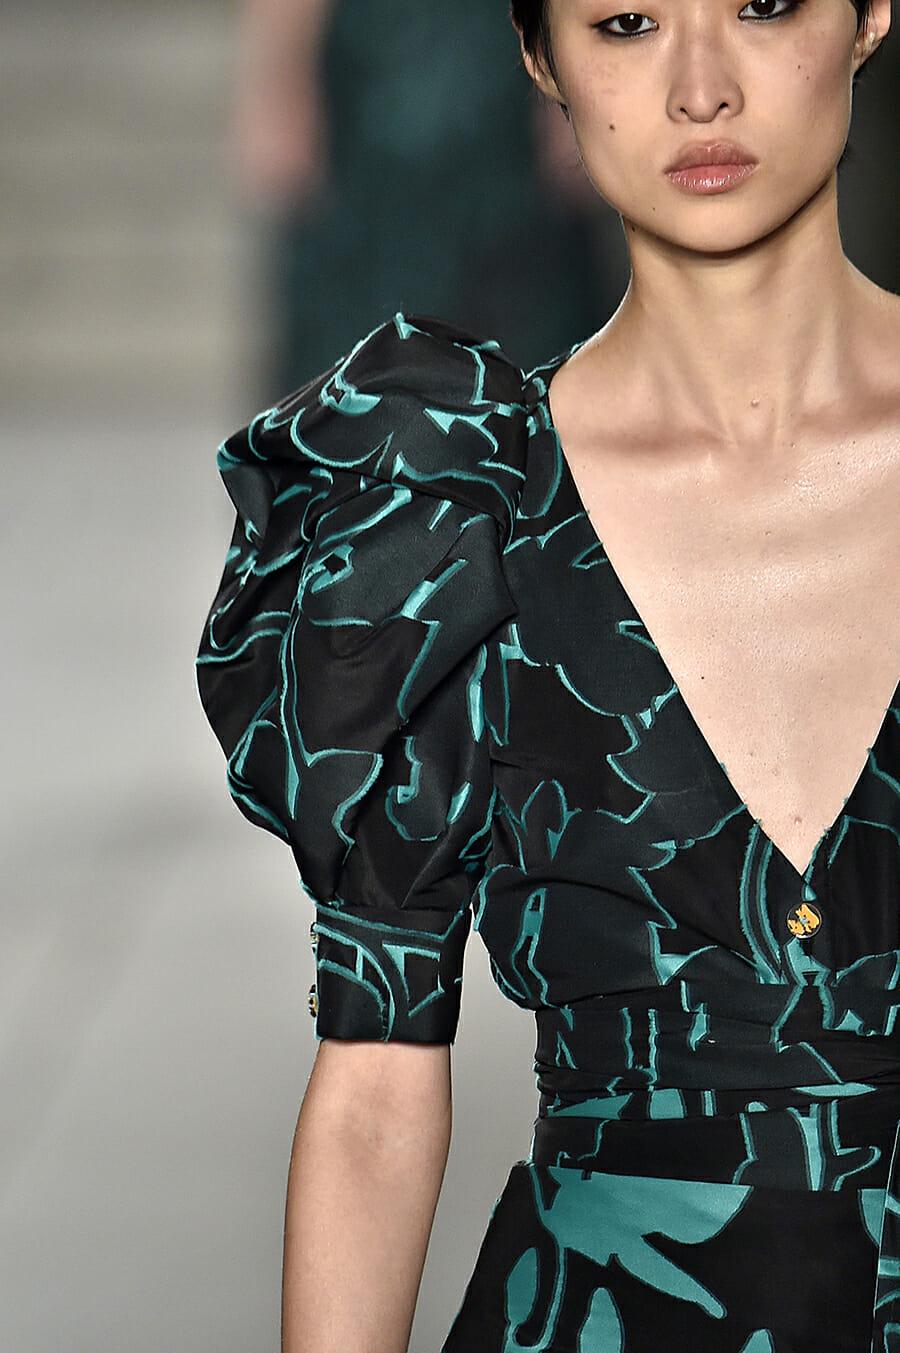 Carolina-Herrera-New-York-Fashion-Week-Spring-Summer-2018-NY-September-2017-look22-detail1